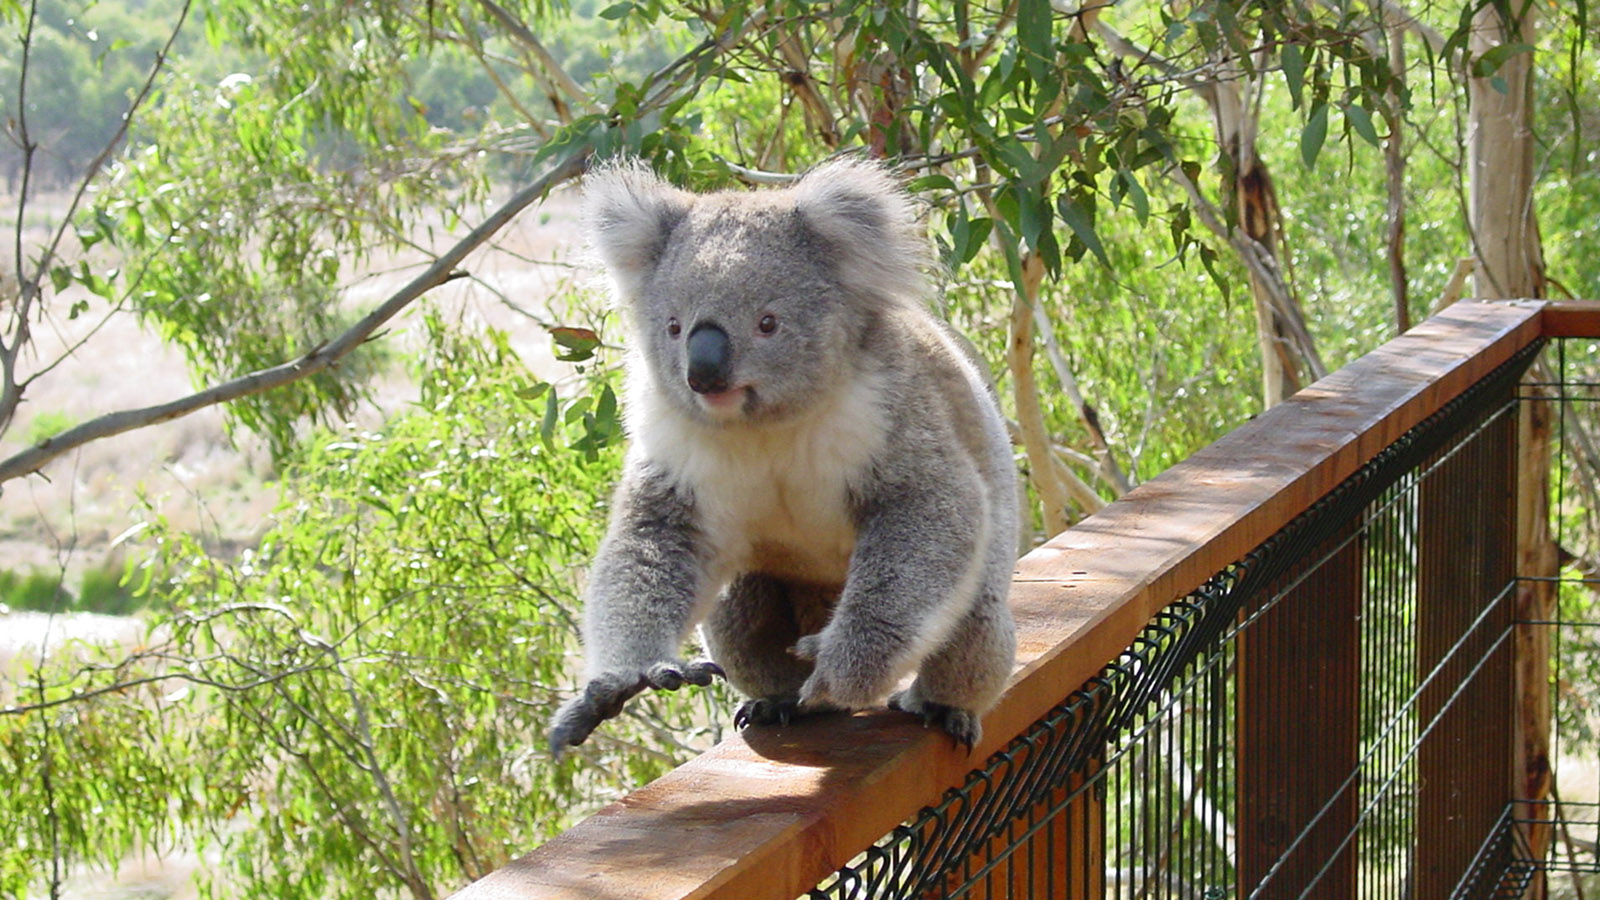 Sydney-Melbourne Coastal Drive: Im Koala Sanctuary laufen die Koalas frei auf der Balustrade umher. Foto: Hilke Maunder